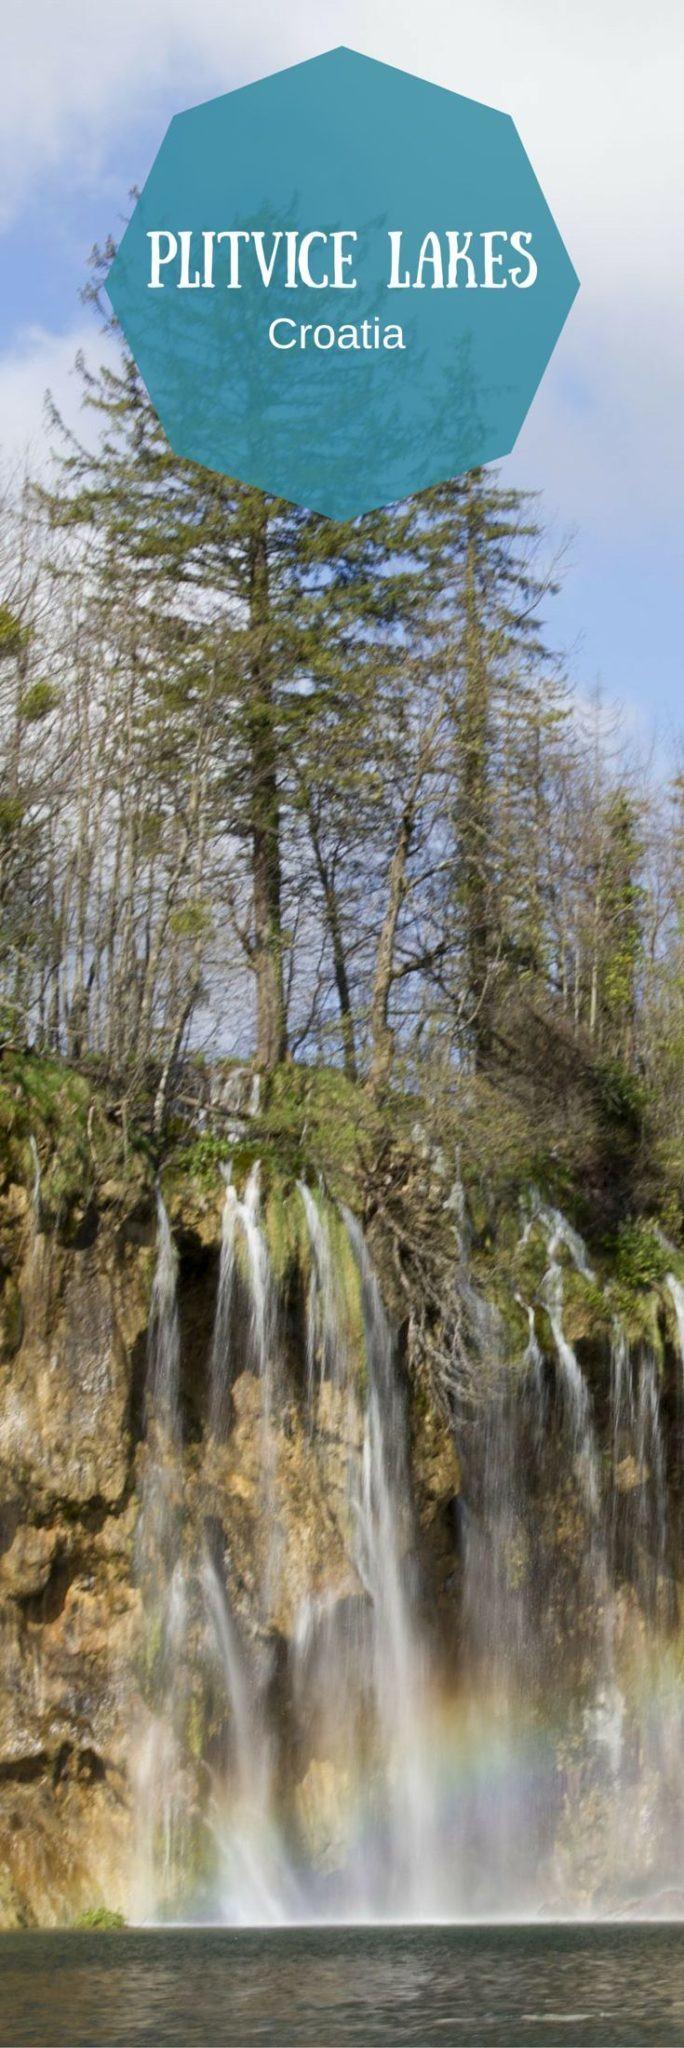 World Heritage Site - Plitvice Lakes